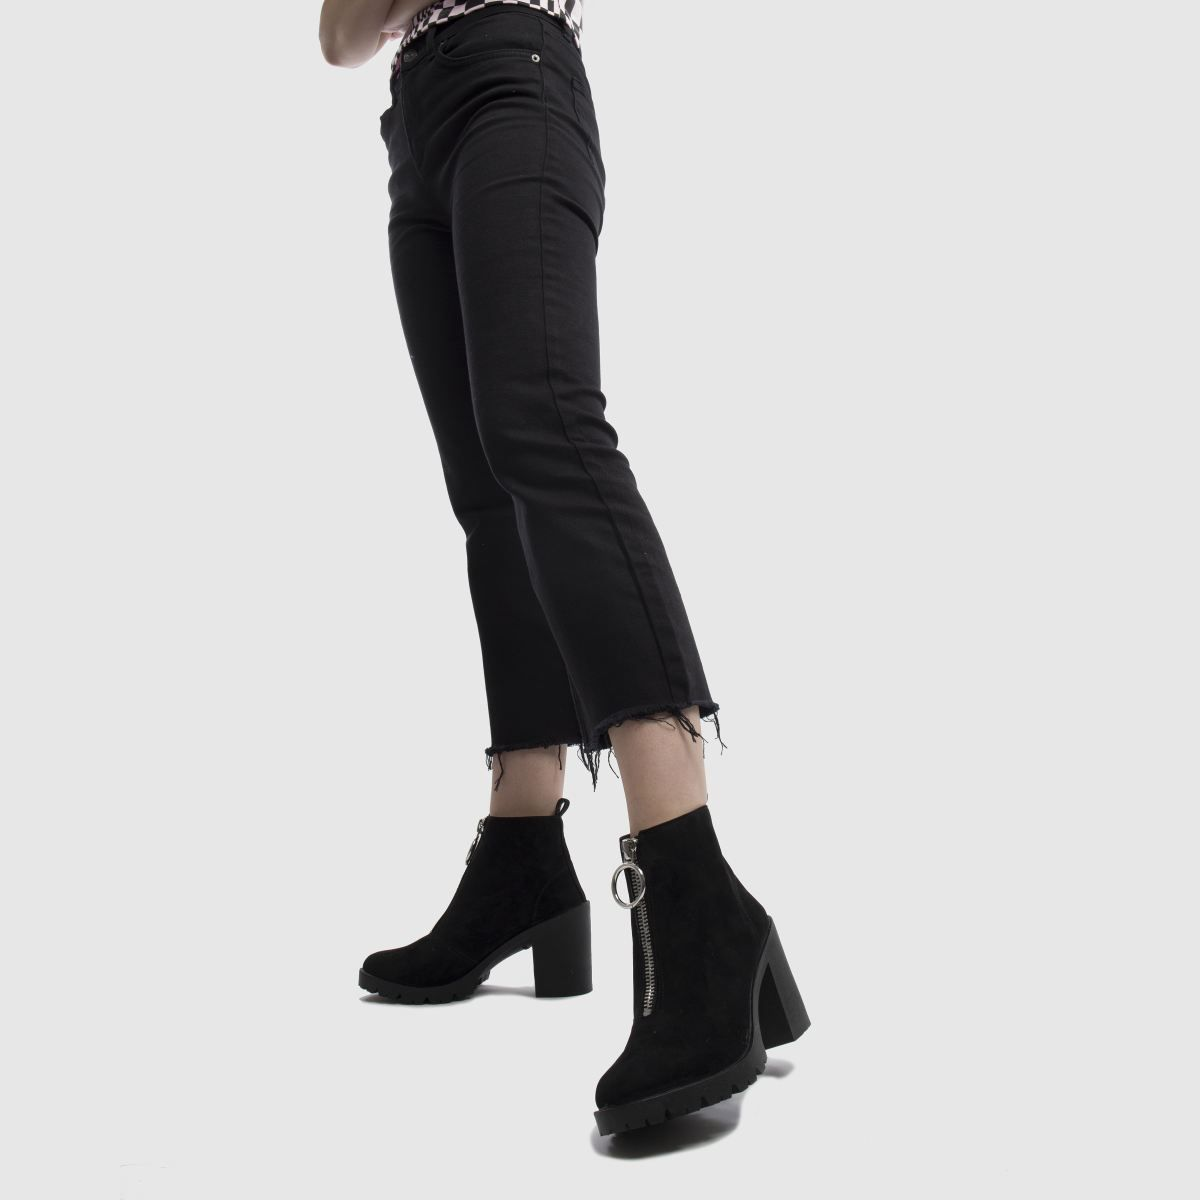 622f7c9a19 schuh black dilemma boots Čižmy Nad Kolená